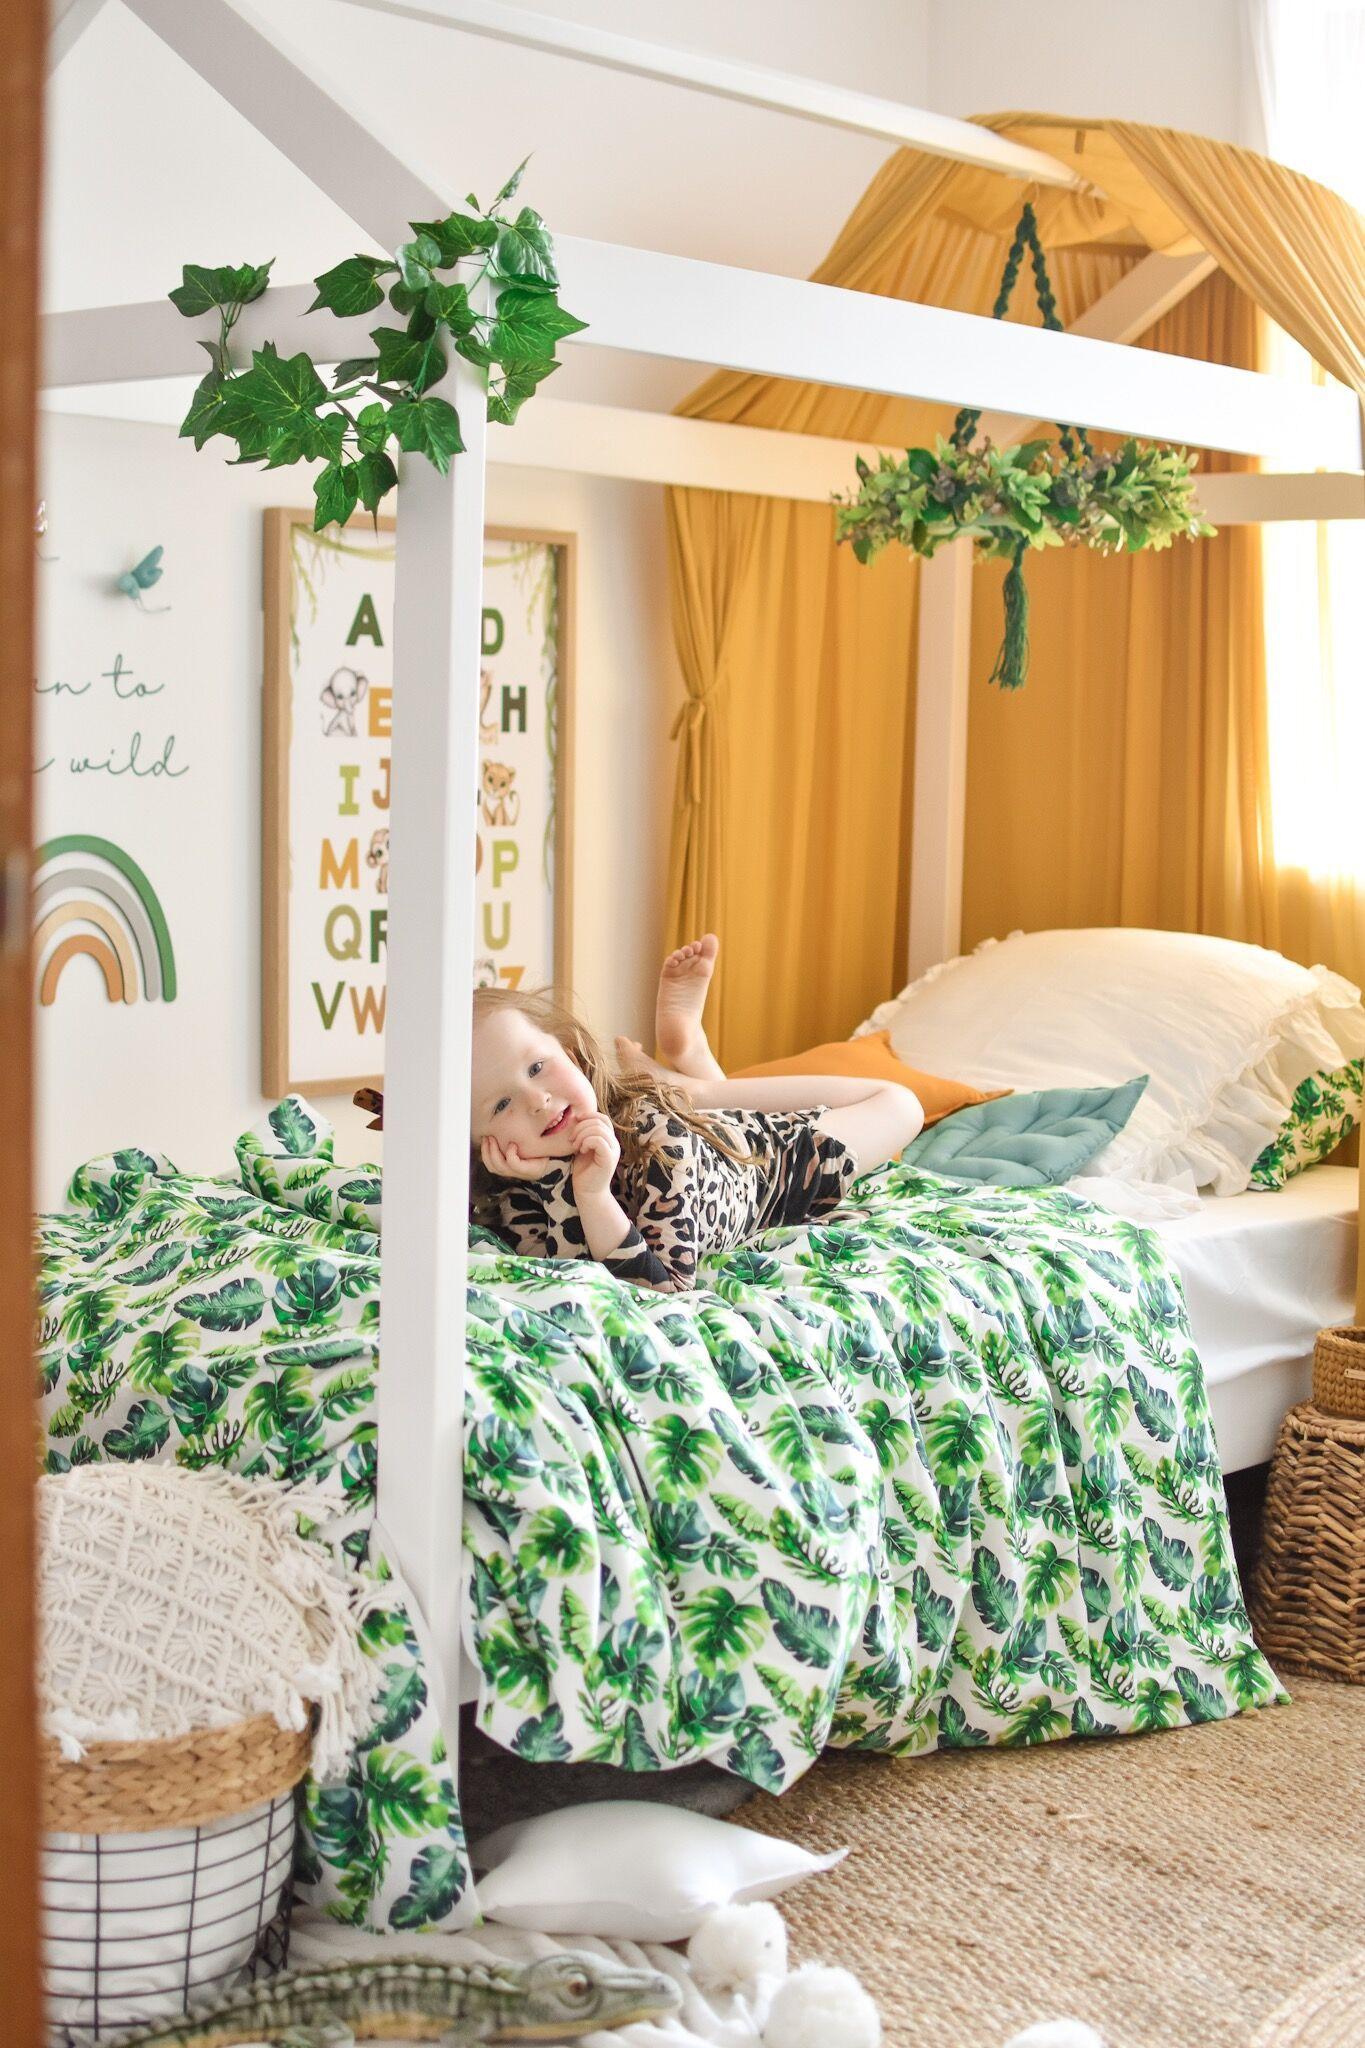 Jungle Inspired Kids Room Ideas Kids Jungle Room Kids Bedroom Inspiration Jungle Bedroom